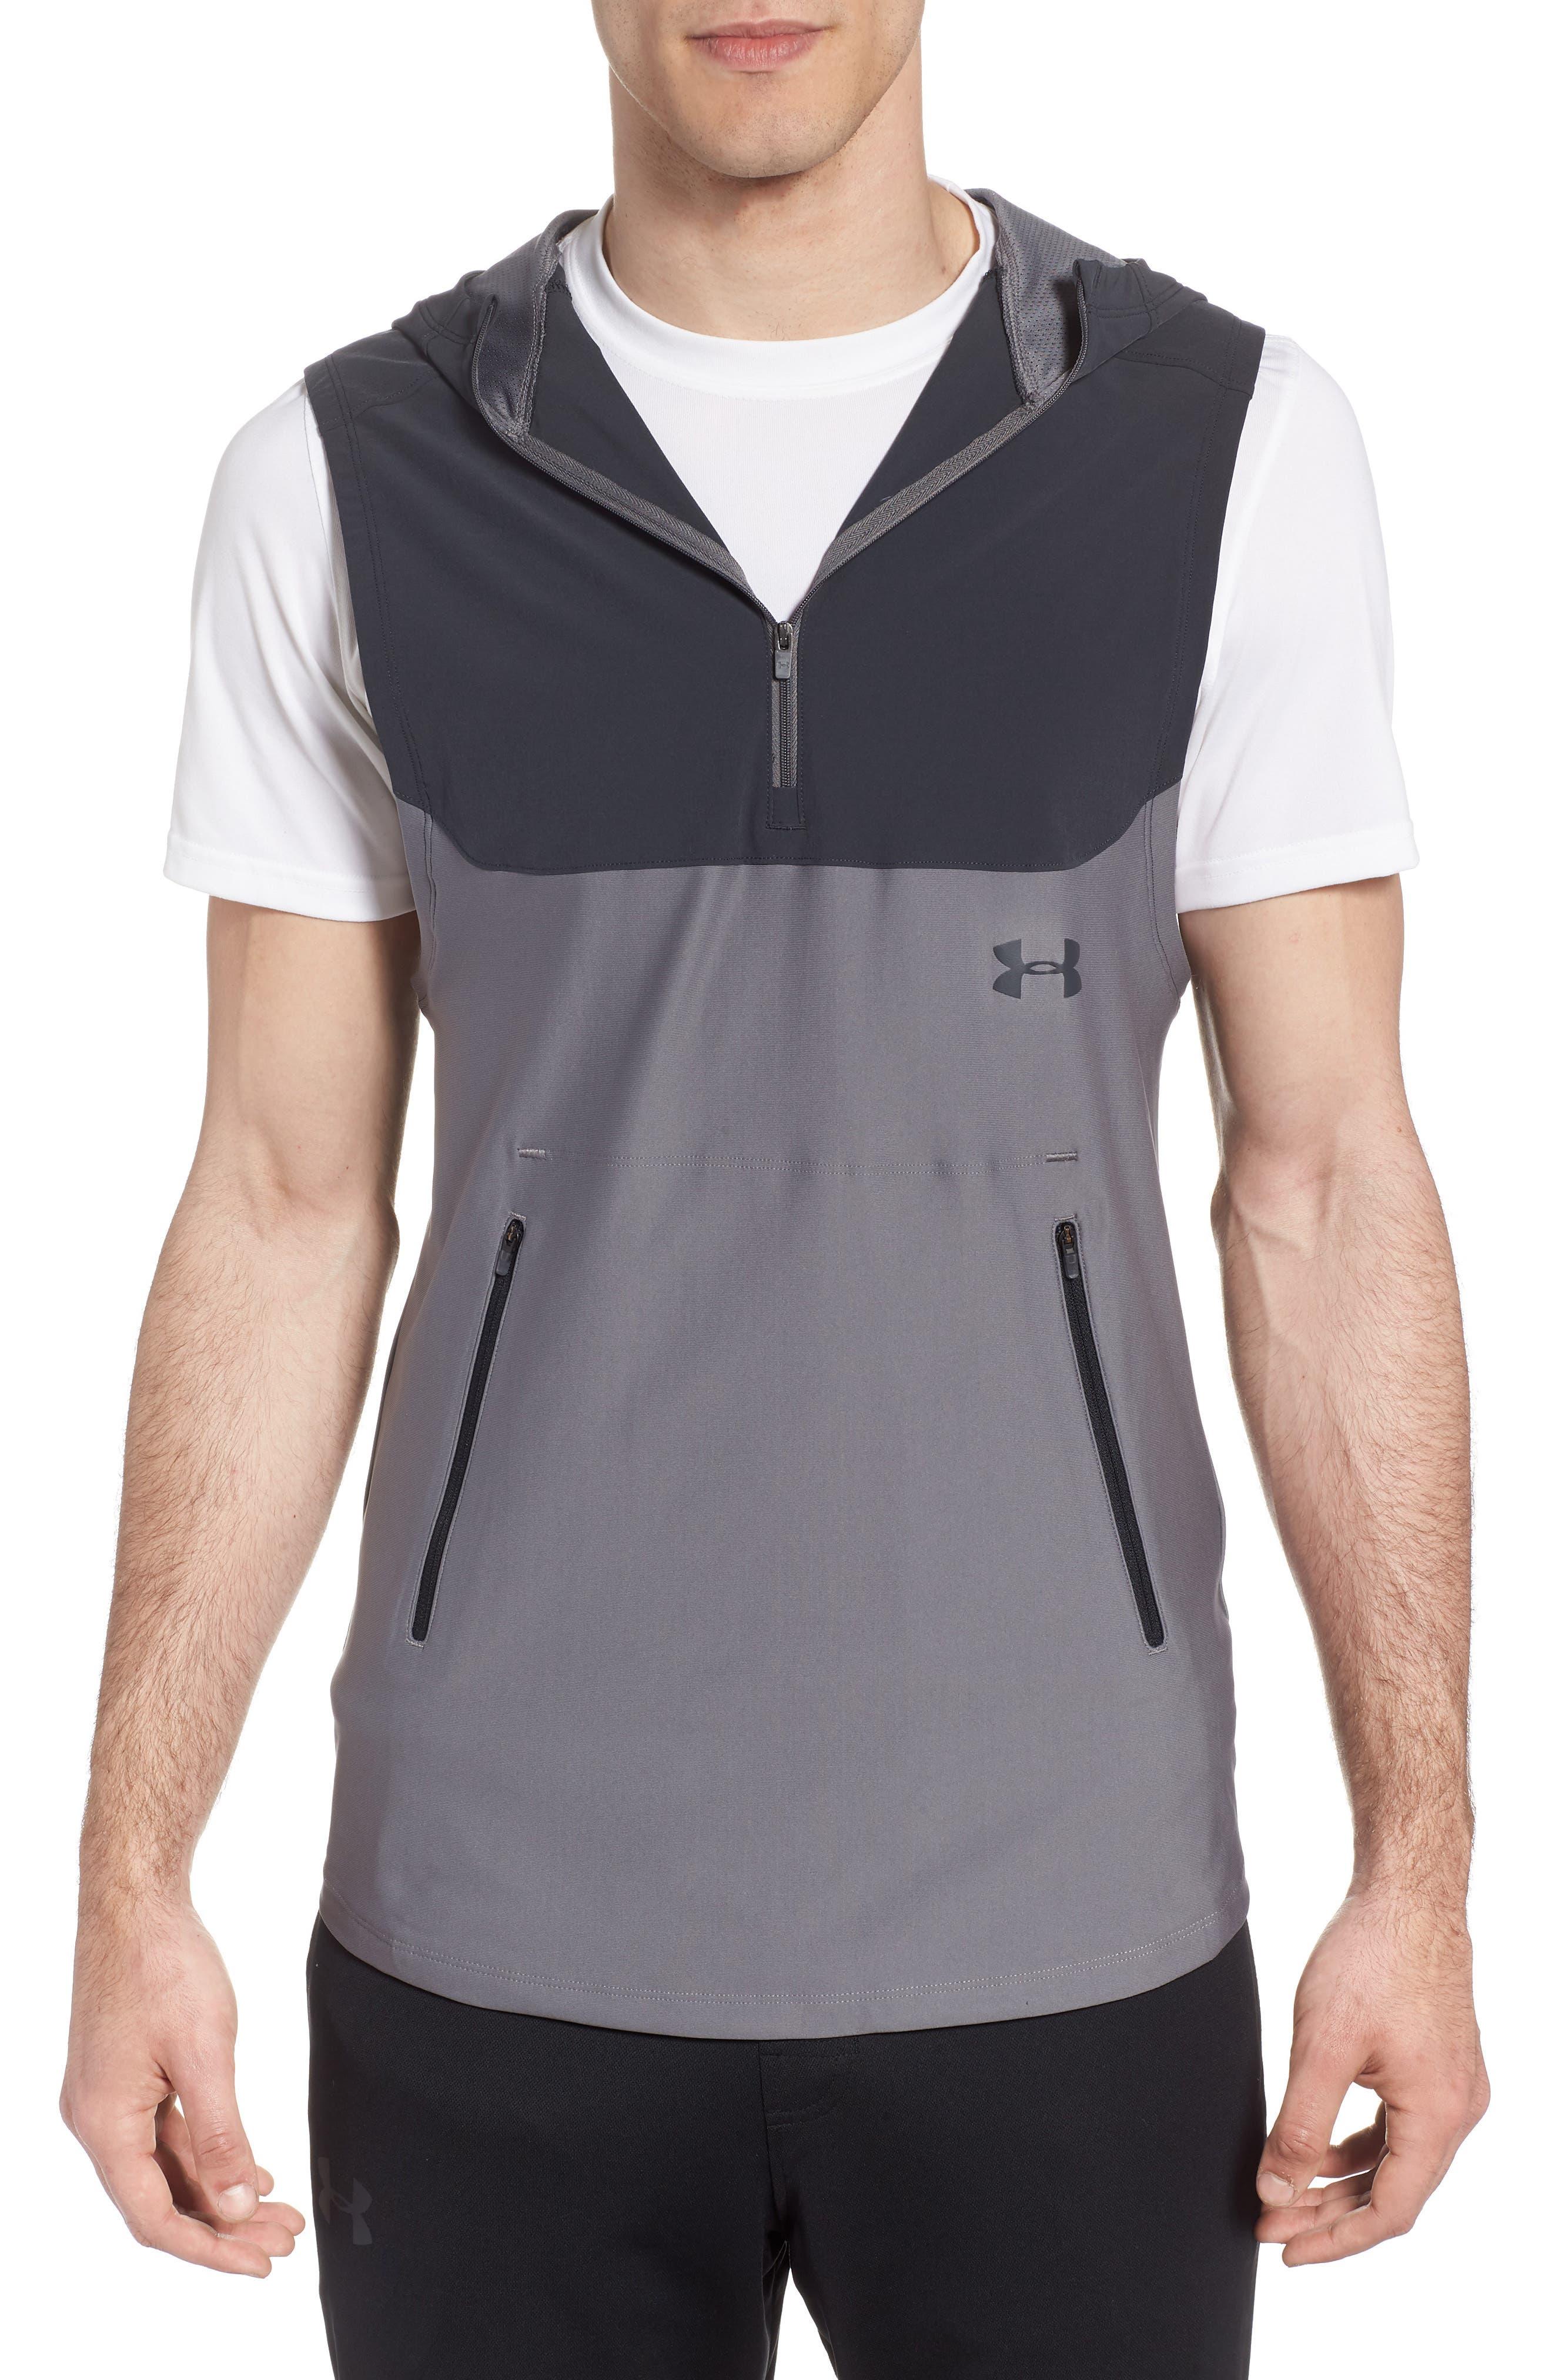 Threadborne Vanish Vest,                             Main thumbnail 1, color,                             Anthracite / Graphite/ Iron